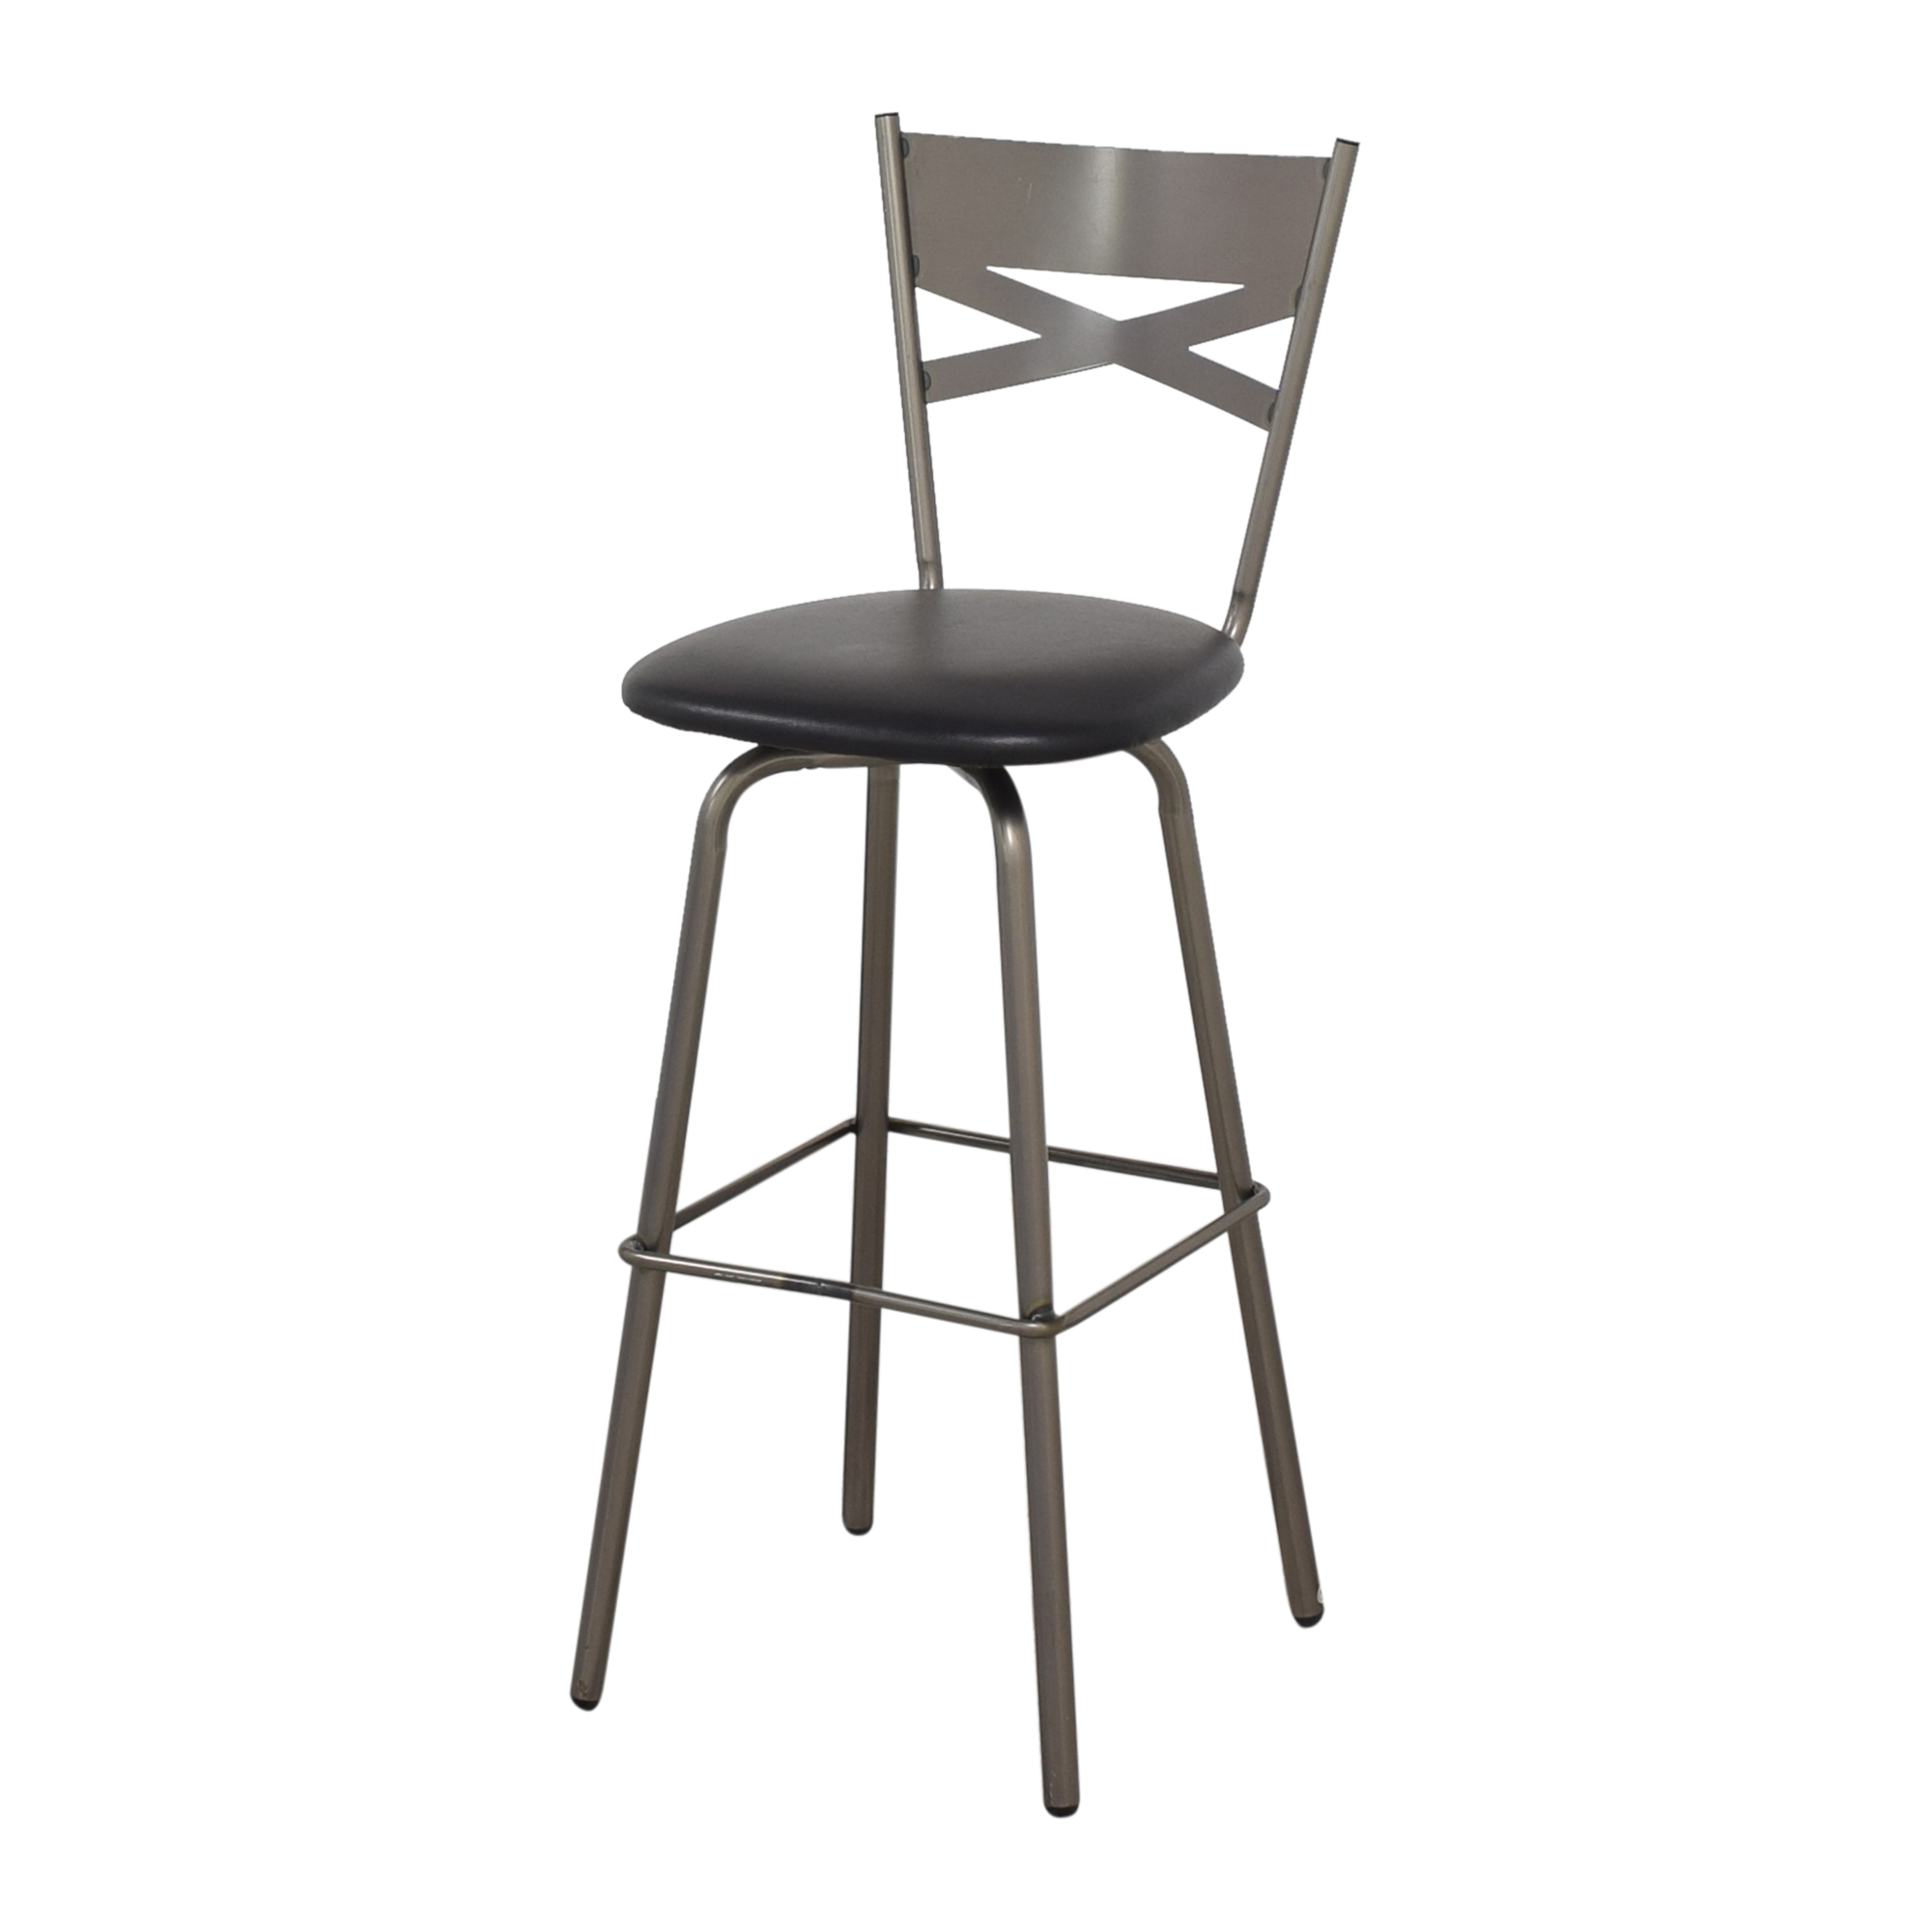 Amisco Amisco Modern Bar Stools Chairs